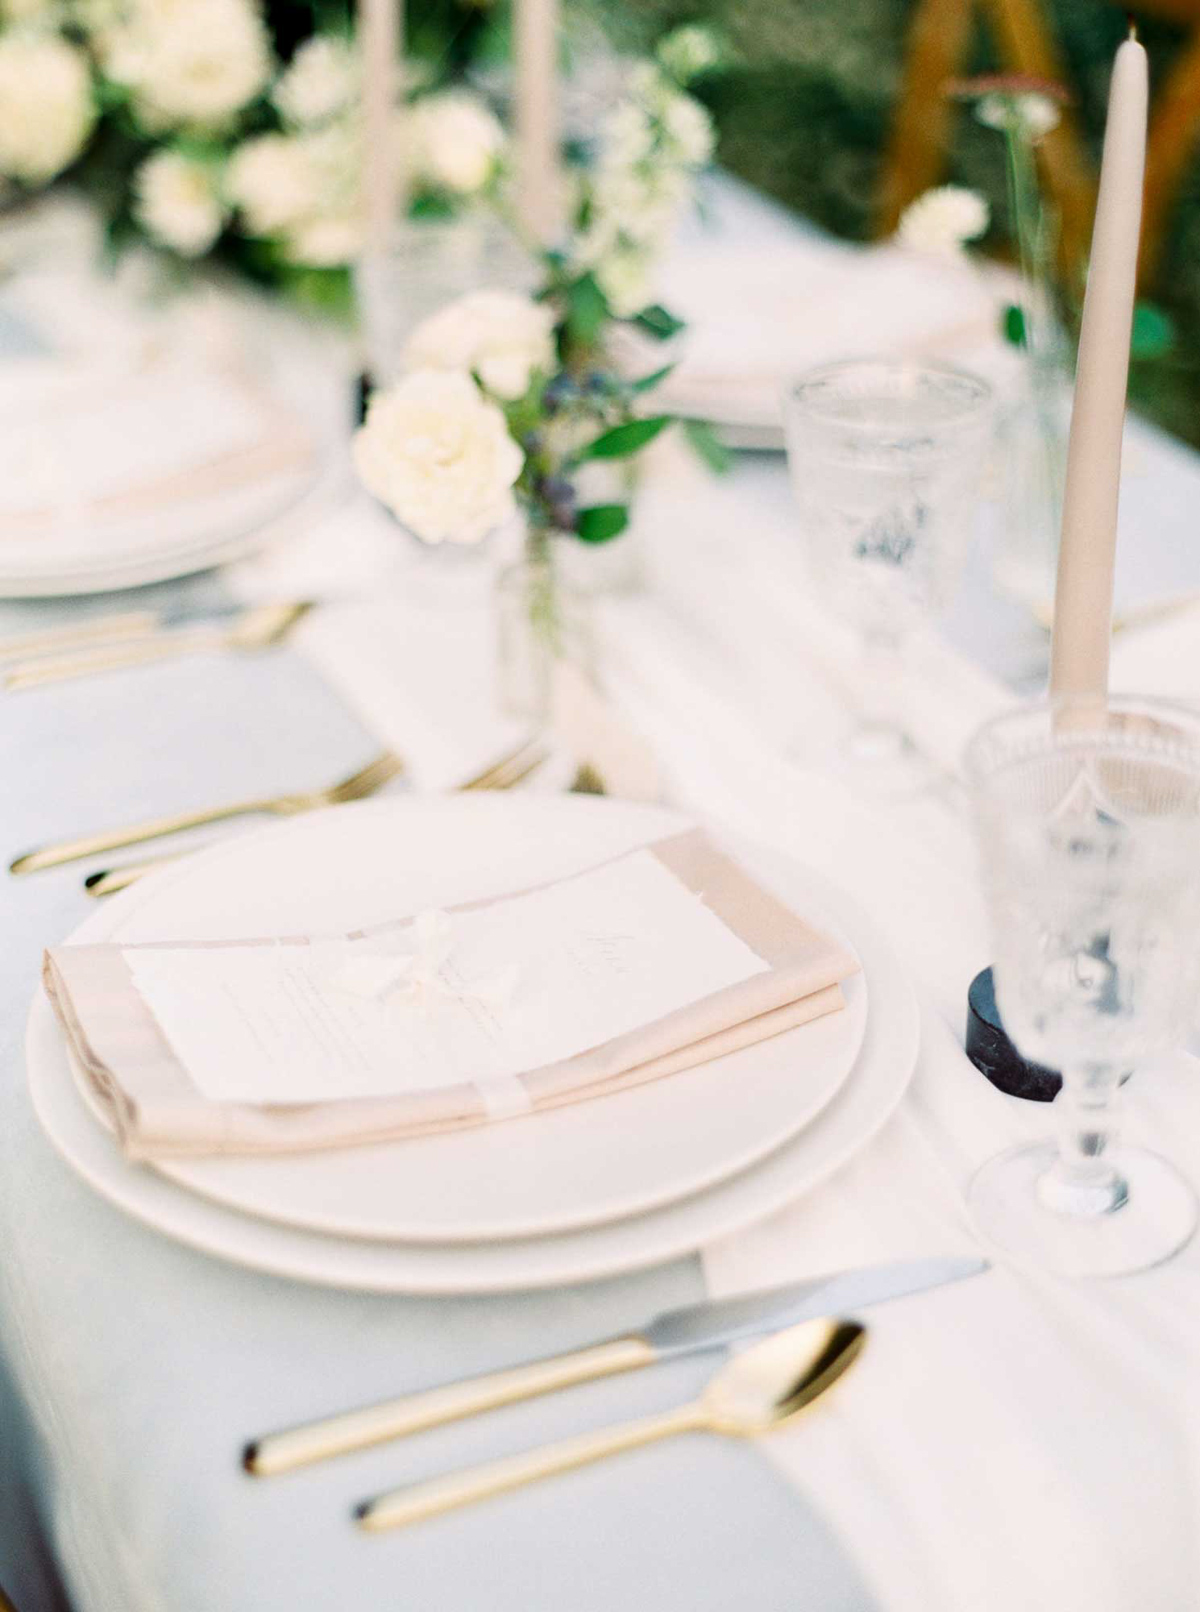 kayla-yestal-vineyard-bride-swish-list-woodland-weddings-niagara-wedding-editorial-65.jpg